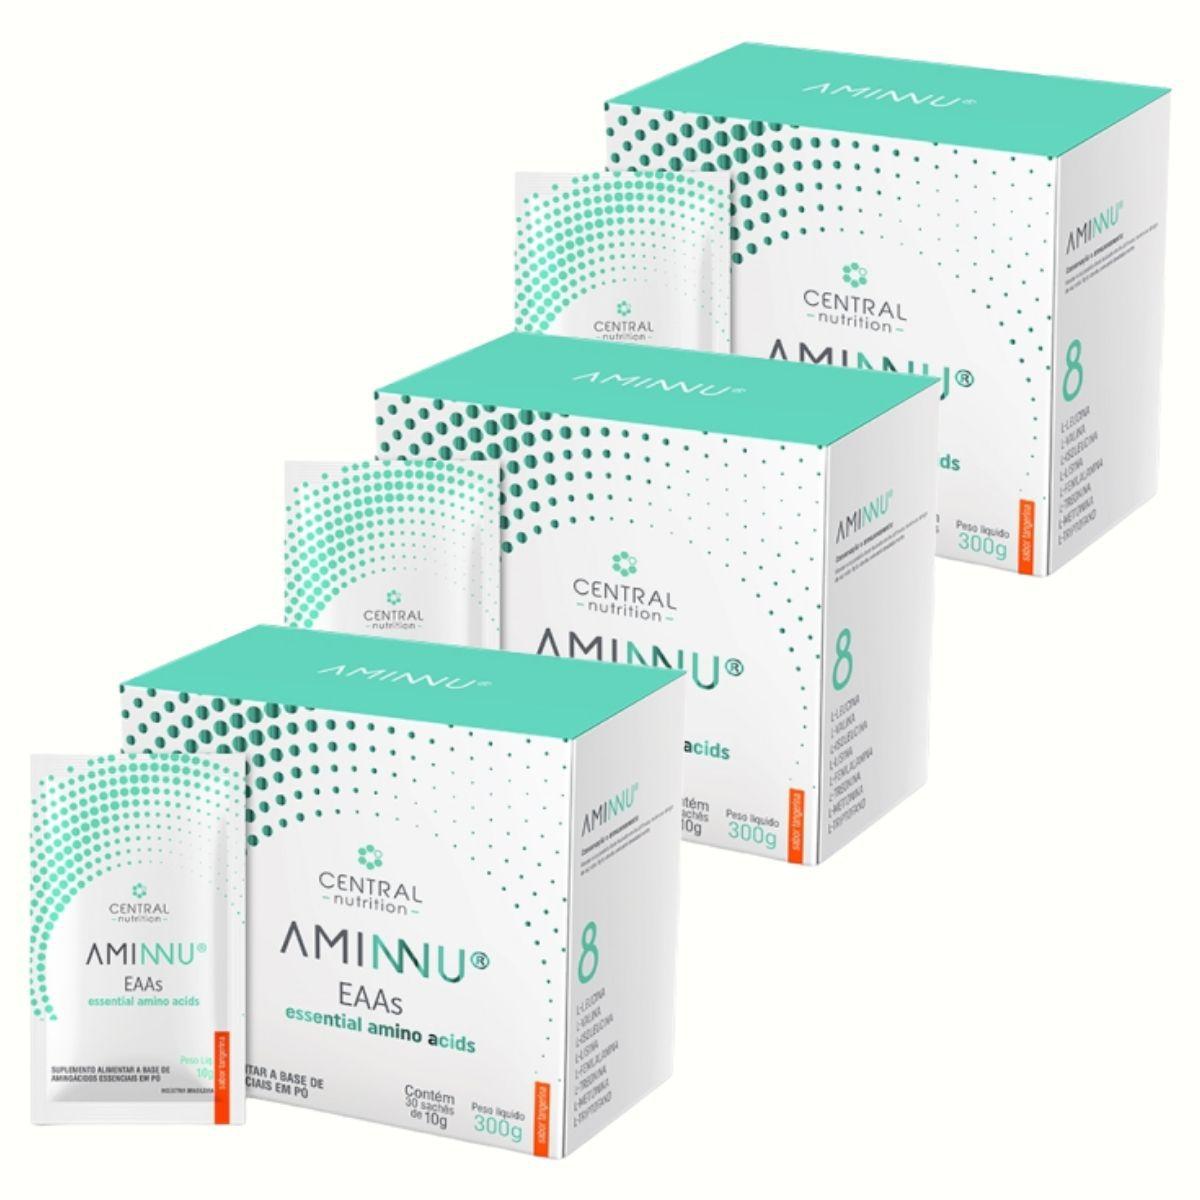 Kit 3 Aminnu Tangerina 10G 30 Sachês EAAs - A Base De Aminoácidos Essenciais - Central Nutrition